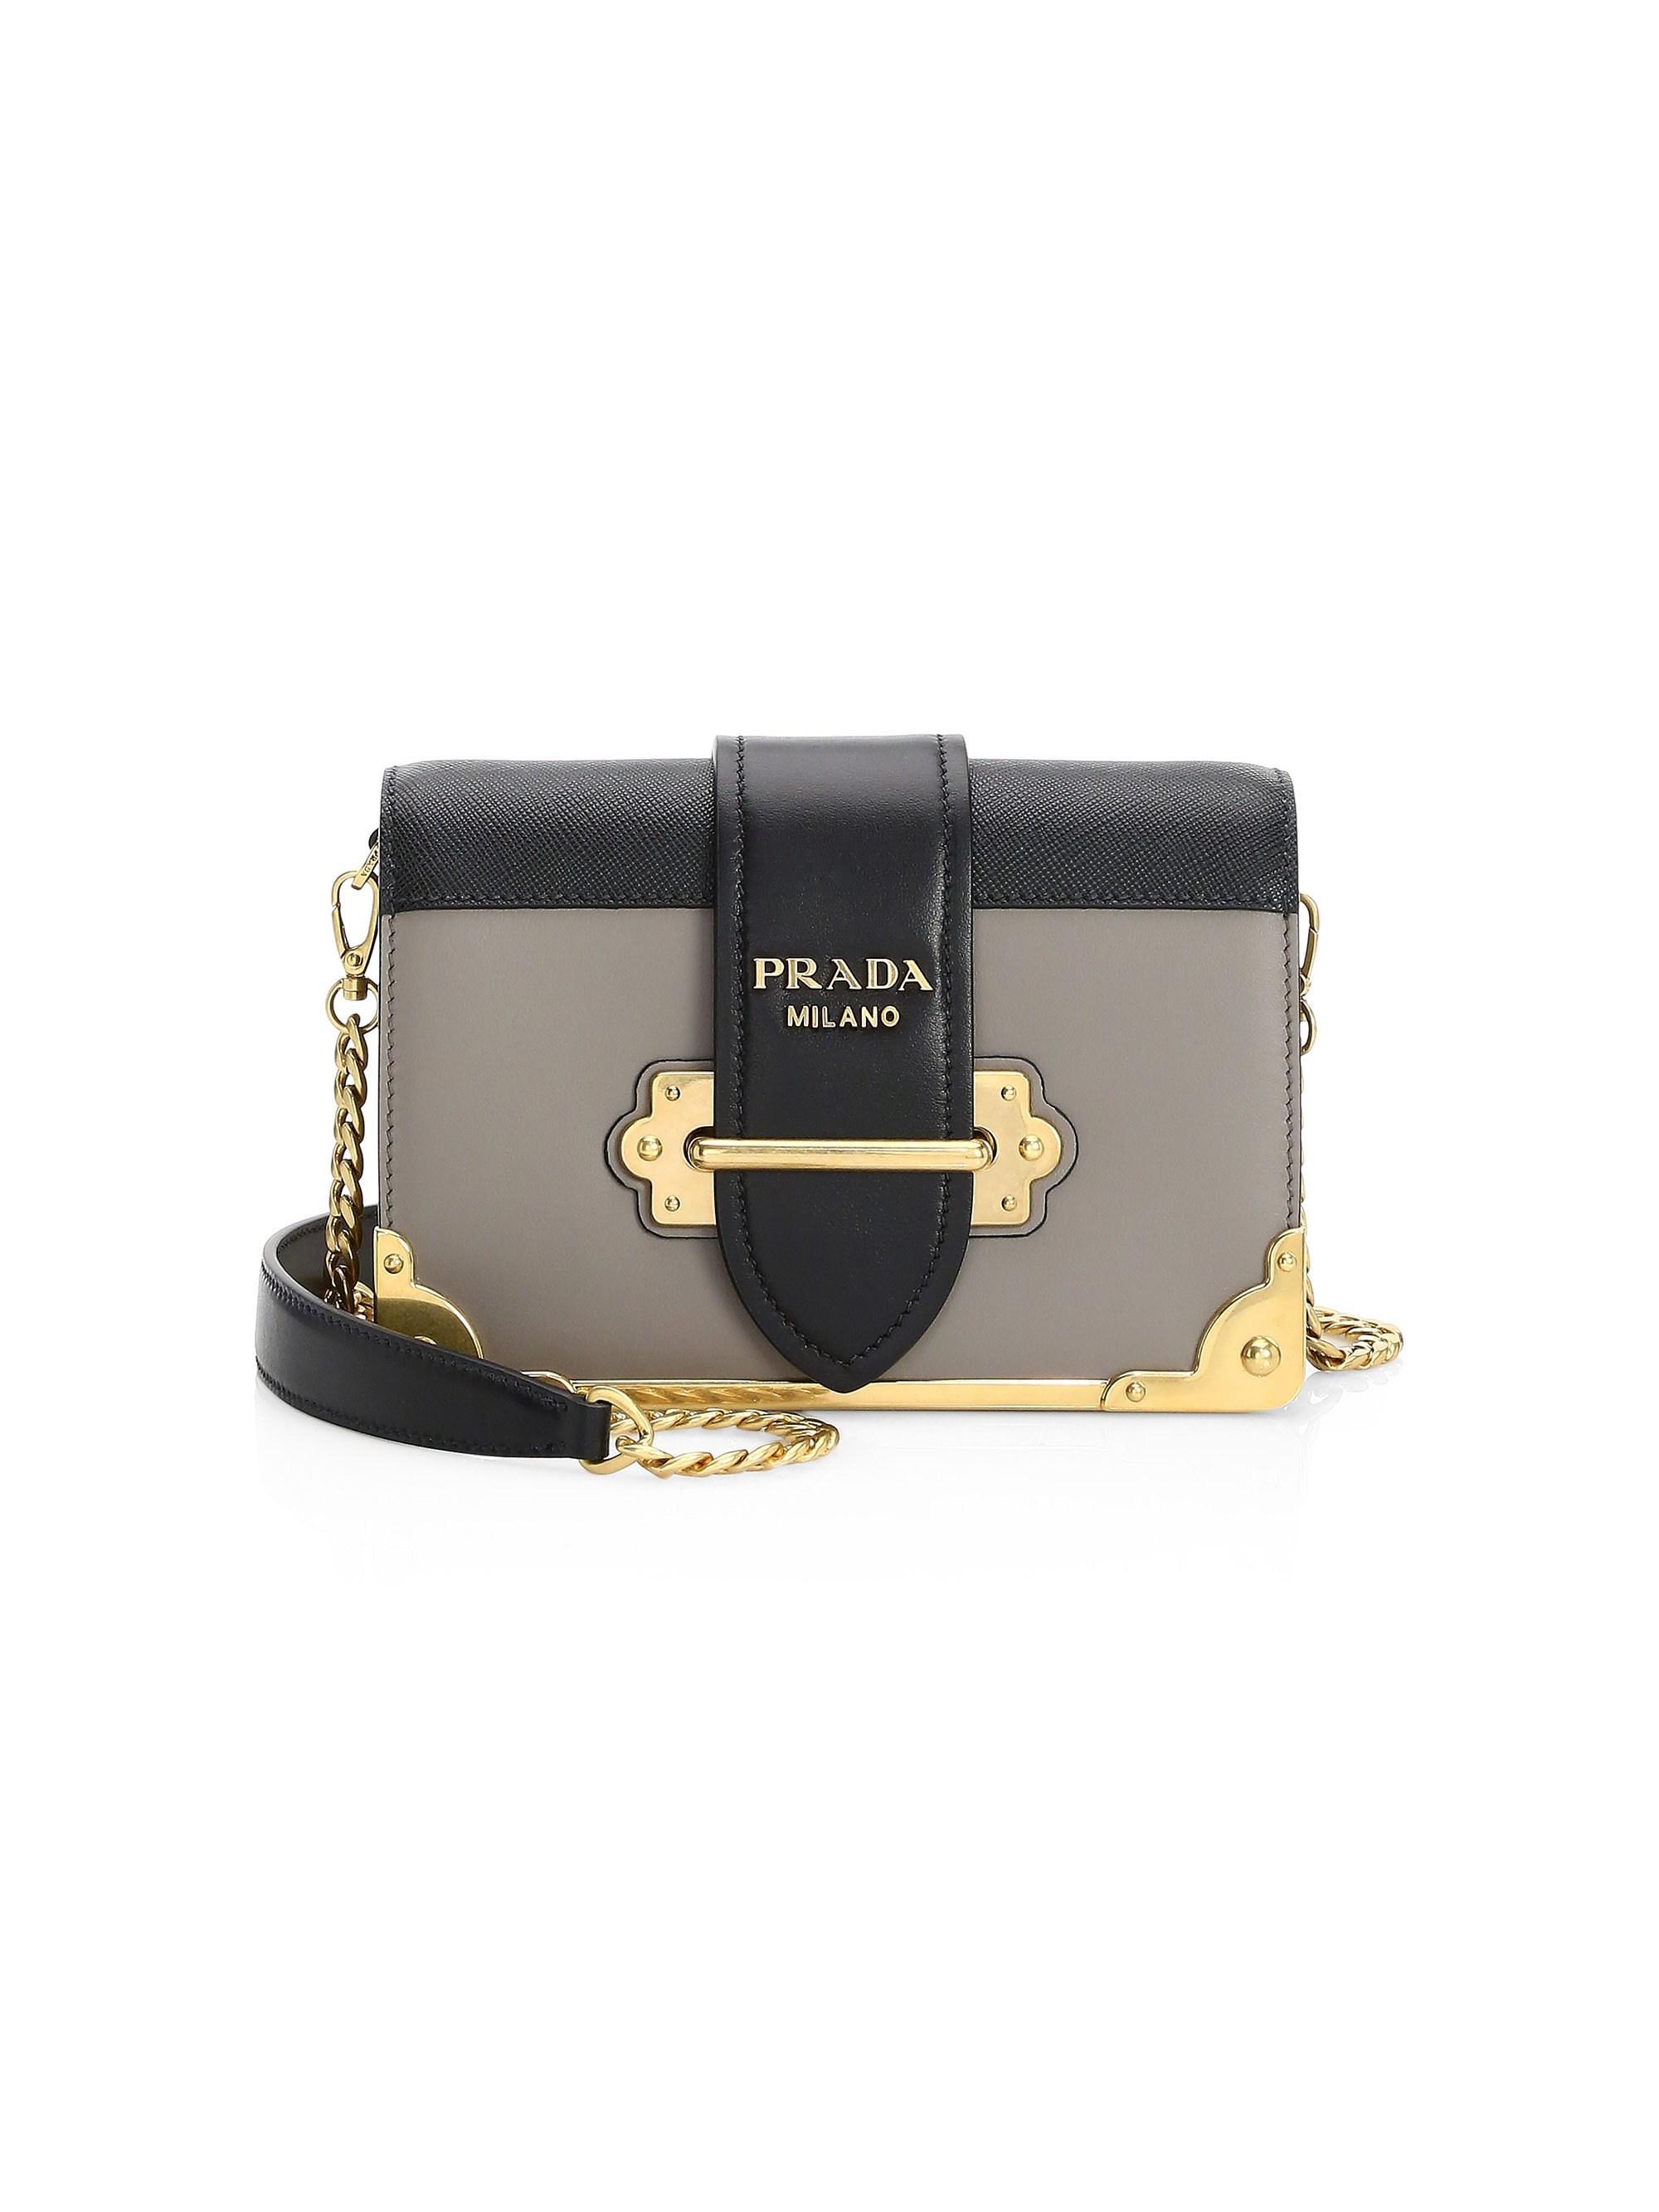 07f1f230d190 Lyst - Prada Women s Small Cahier Leather Crossbody Bag - Mughetto ...